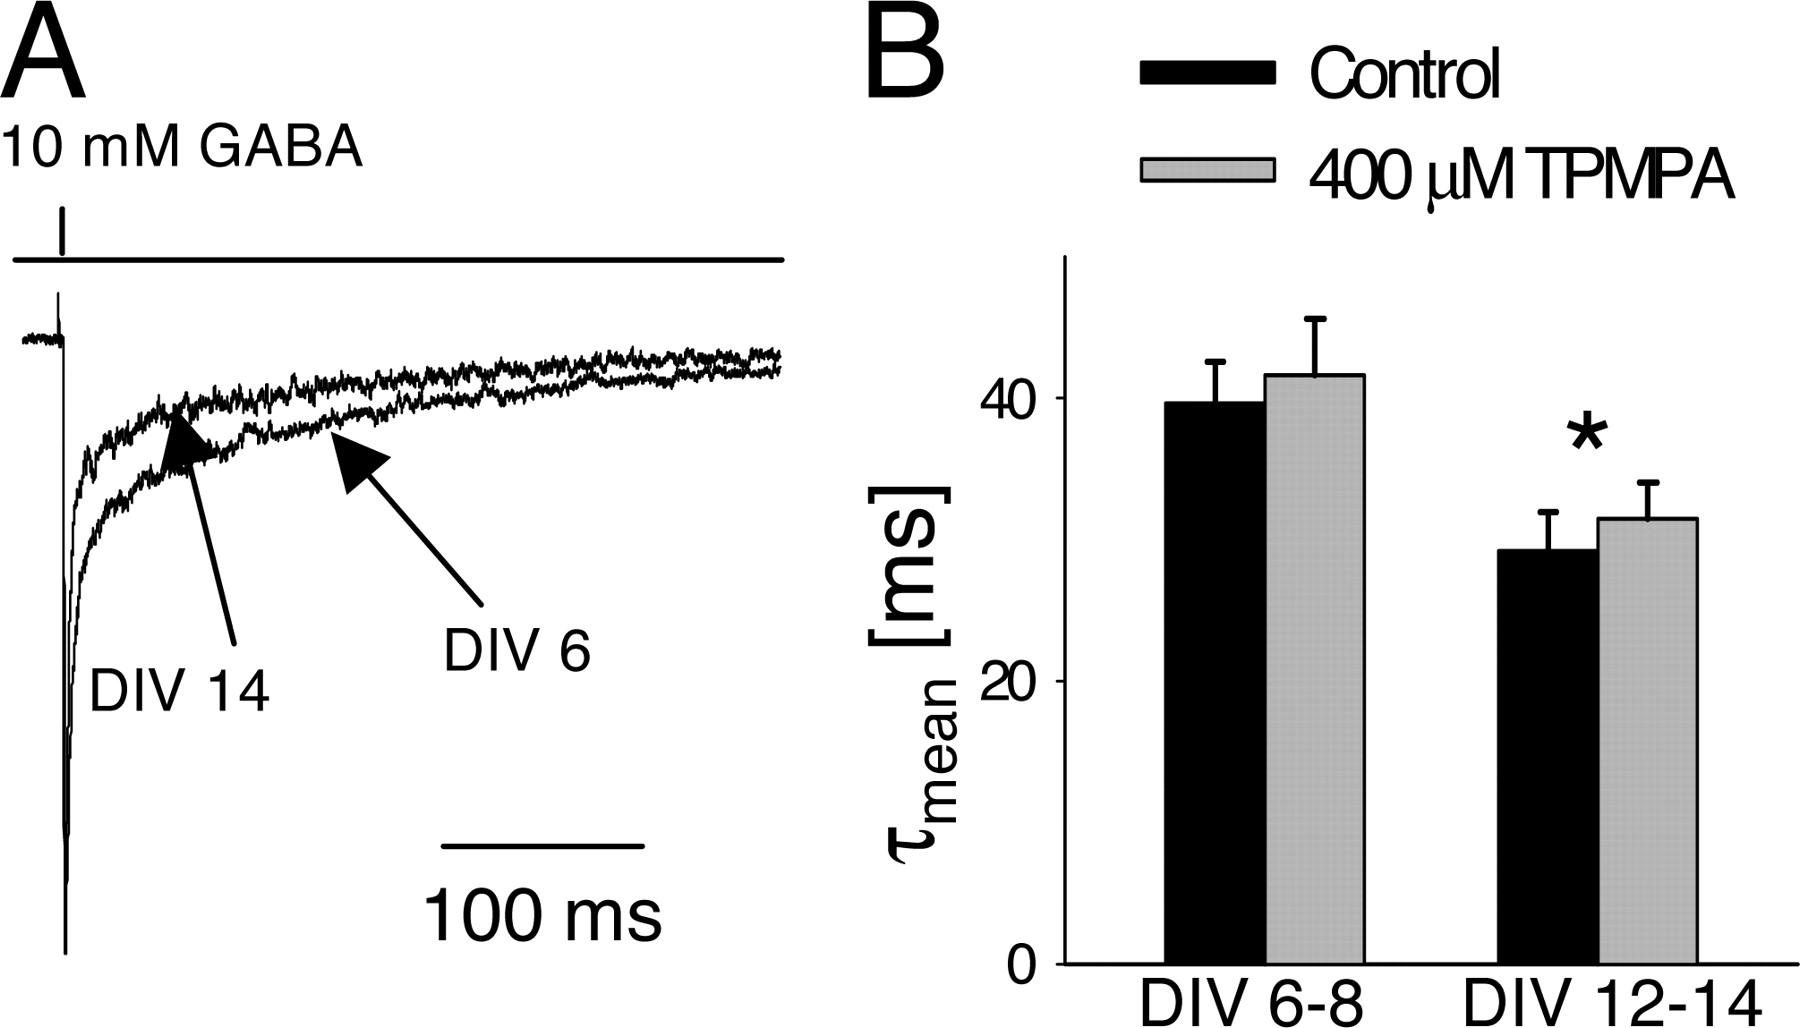 Developmental Changes Of Gaba Synaptic Transient In Cerebellar Figure 5 The Block Diagram Bis Algorithm Abbreviations Bsr Download